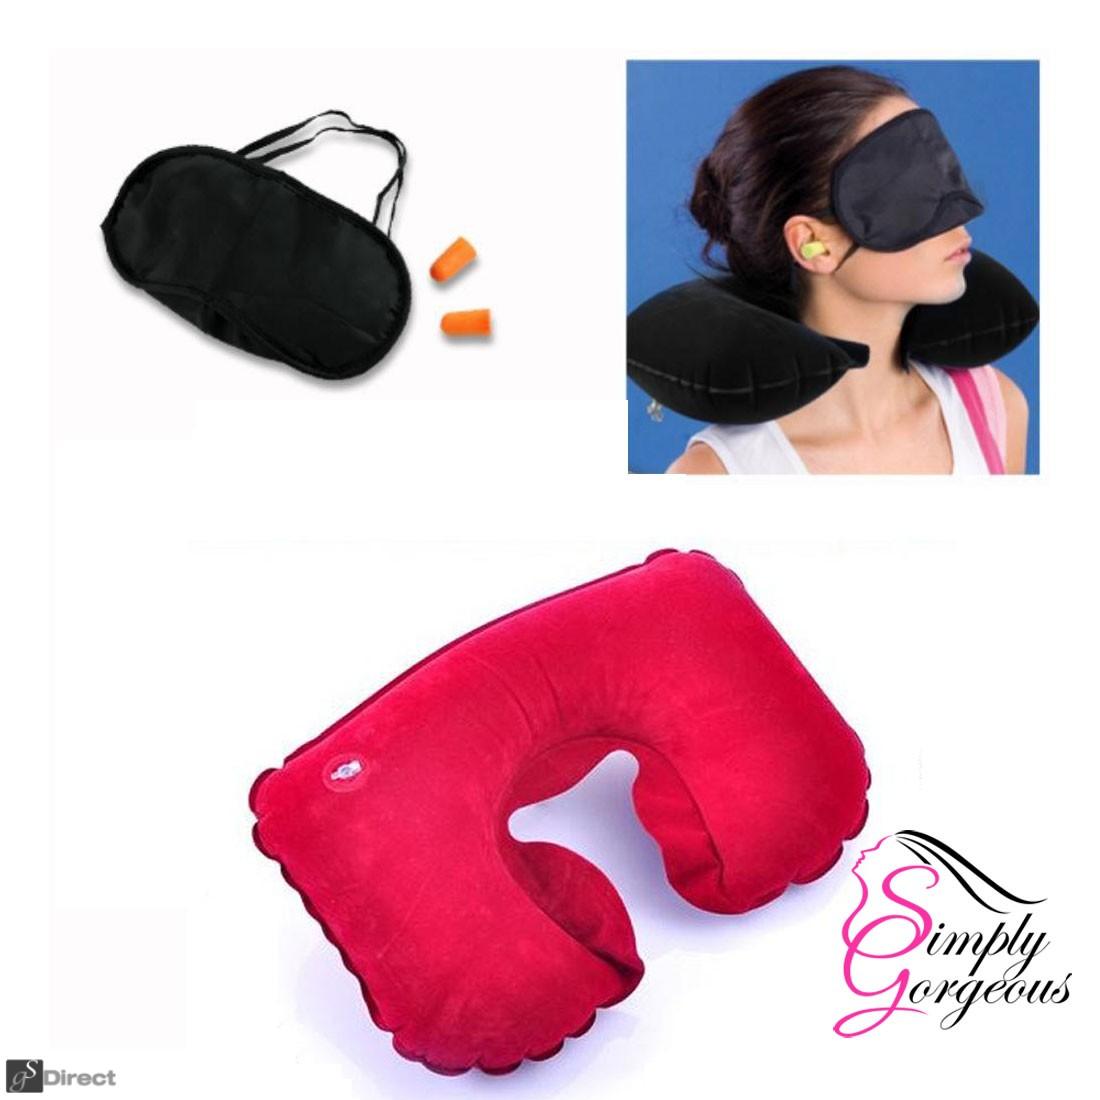 Inflatable Travel Neck Pillow Ear Plug & Sleep Mask Set - Red